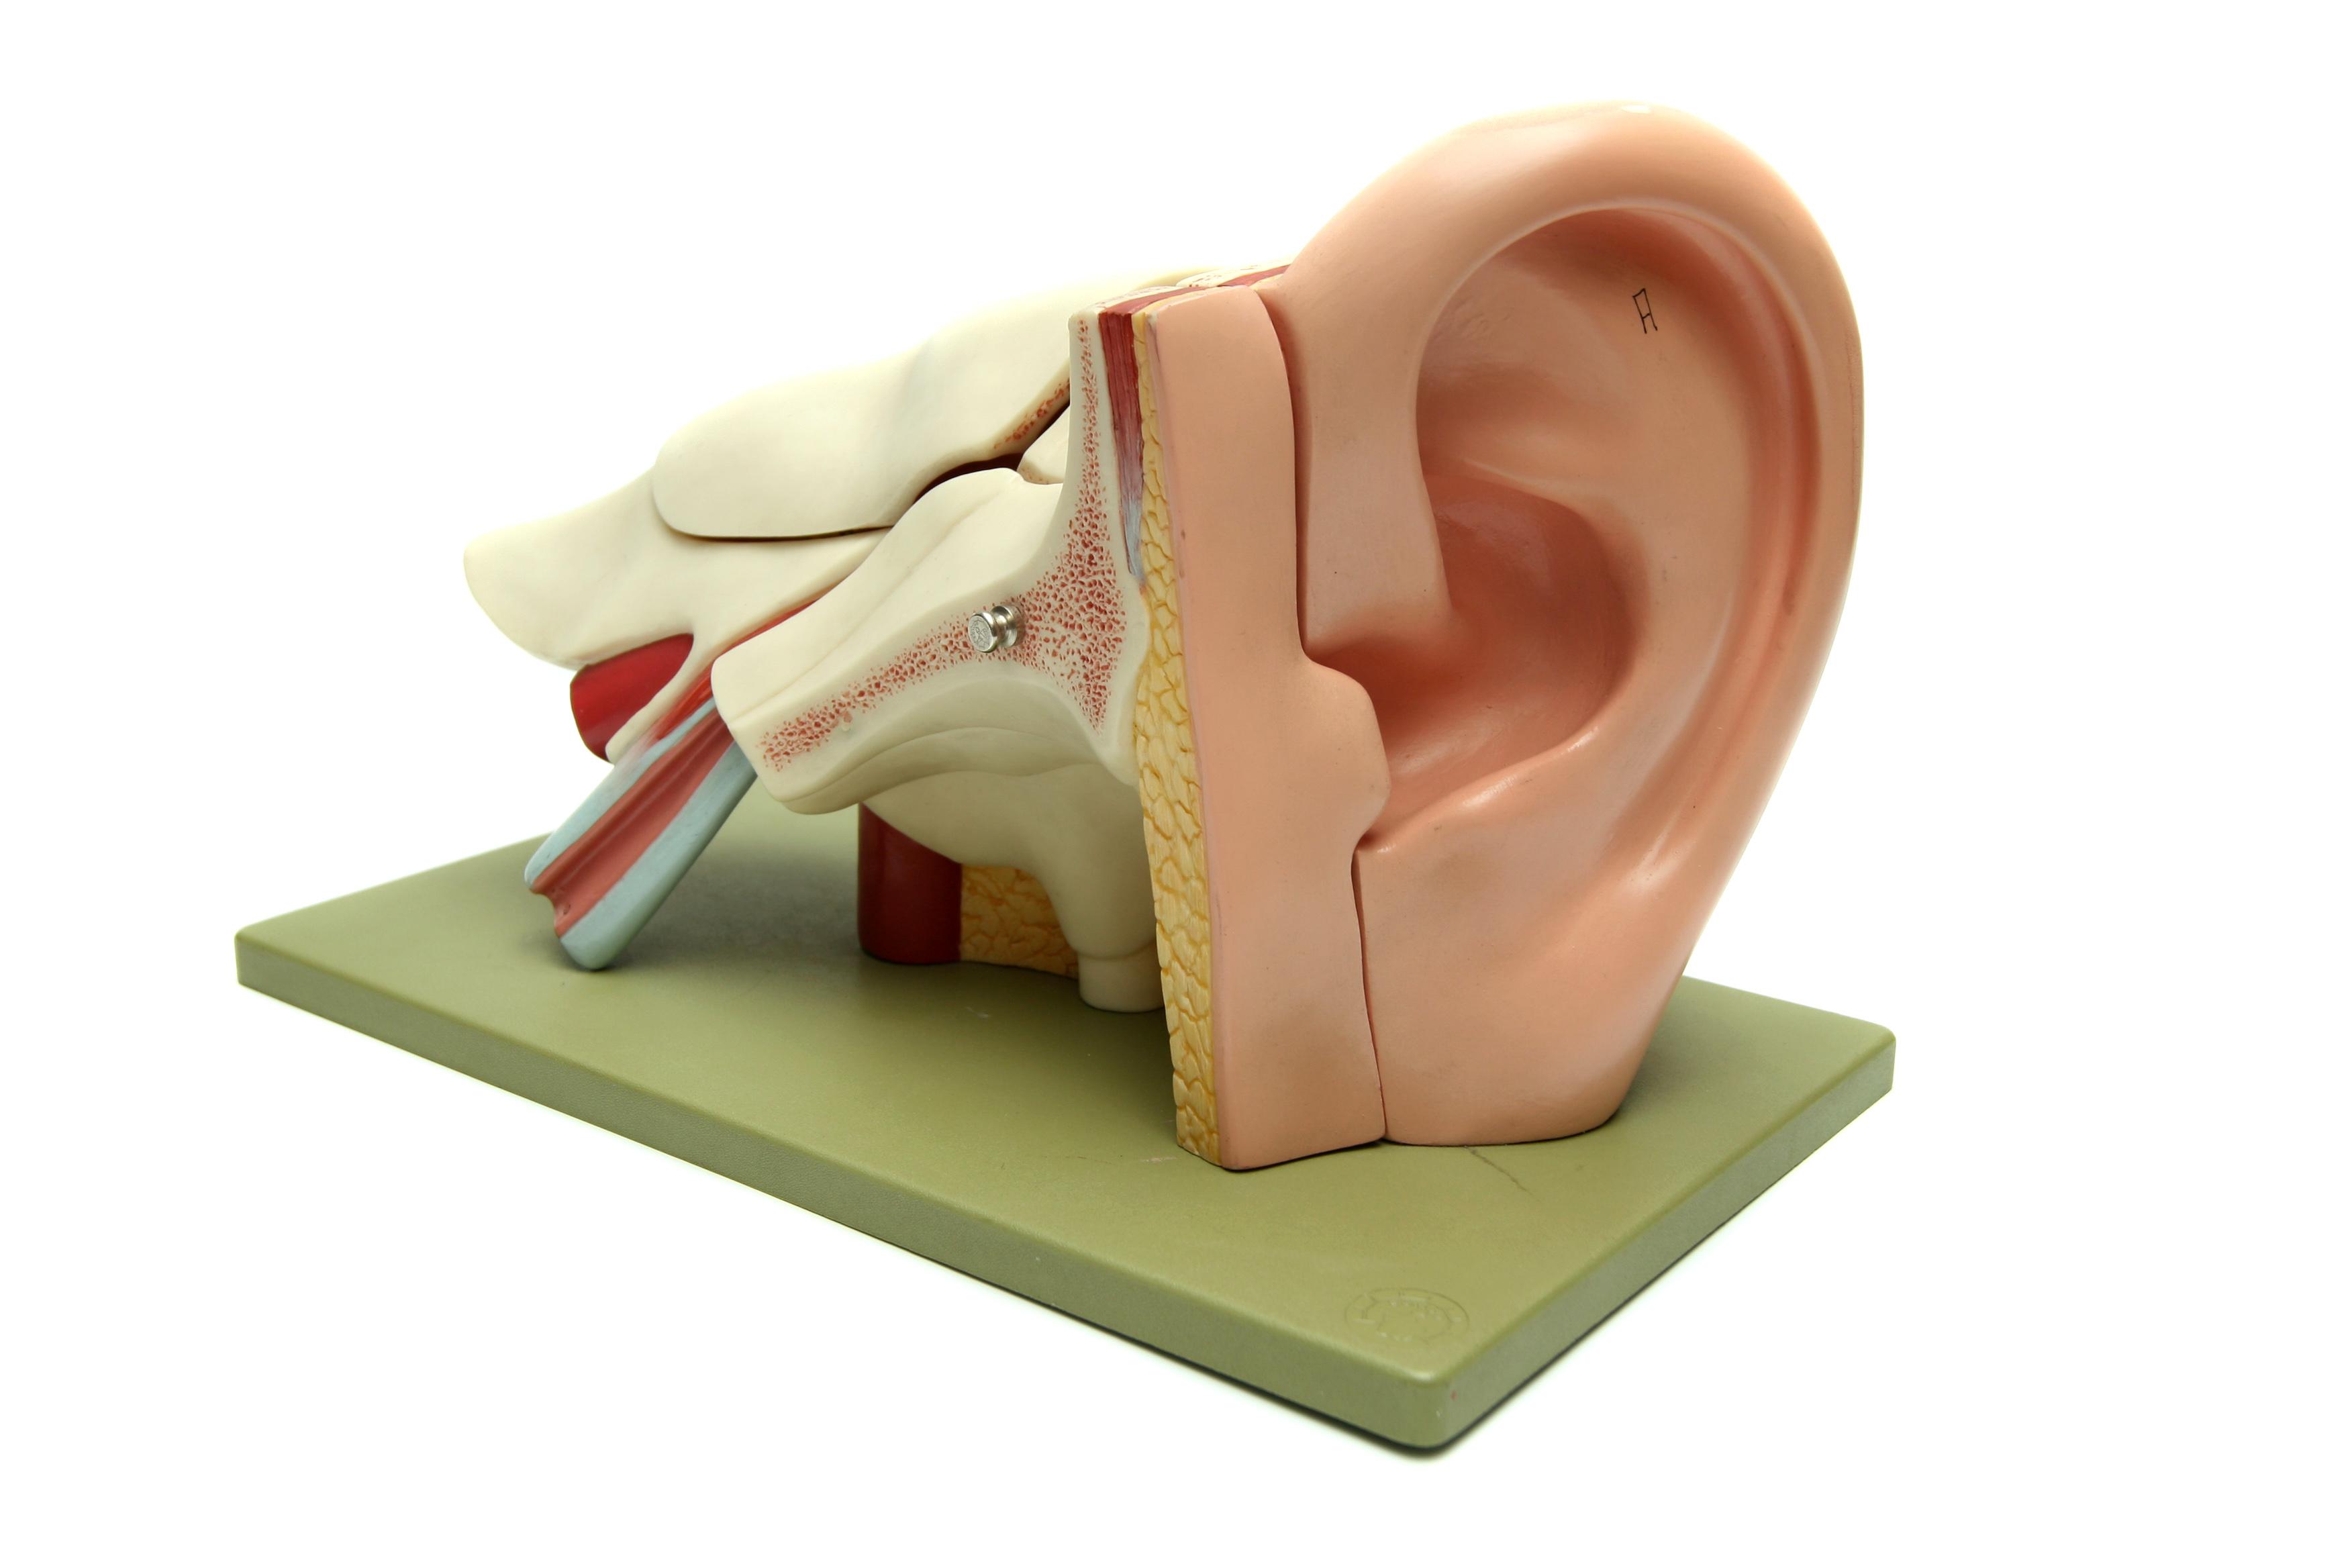 Audioprotesista, non basta la parola